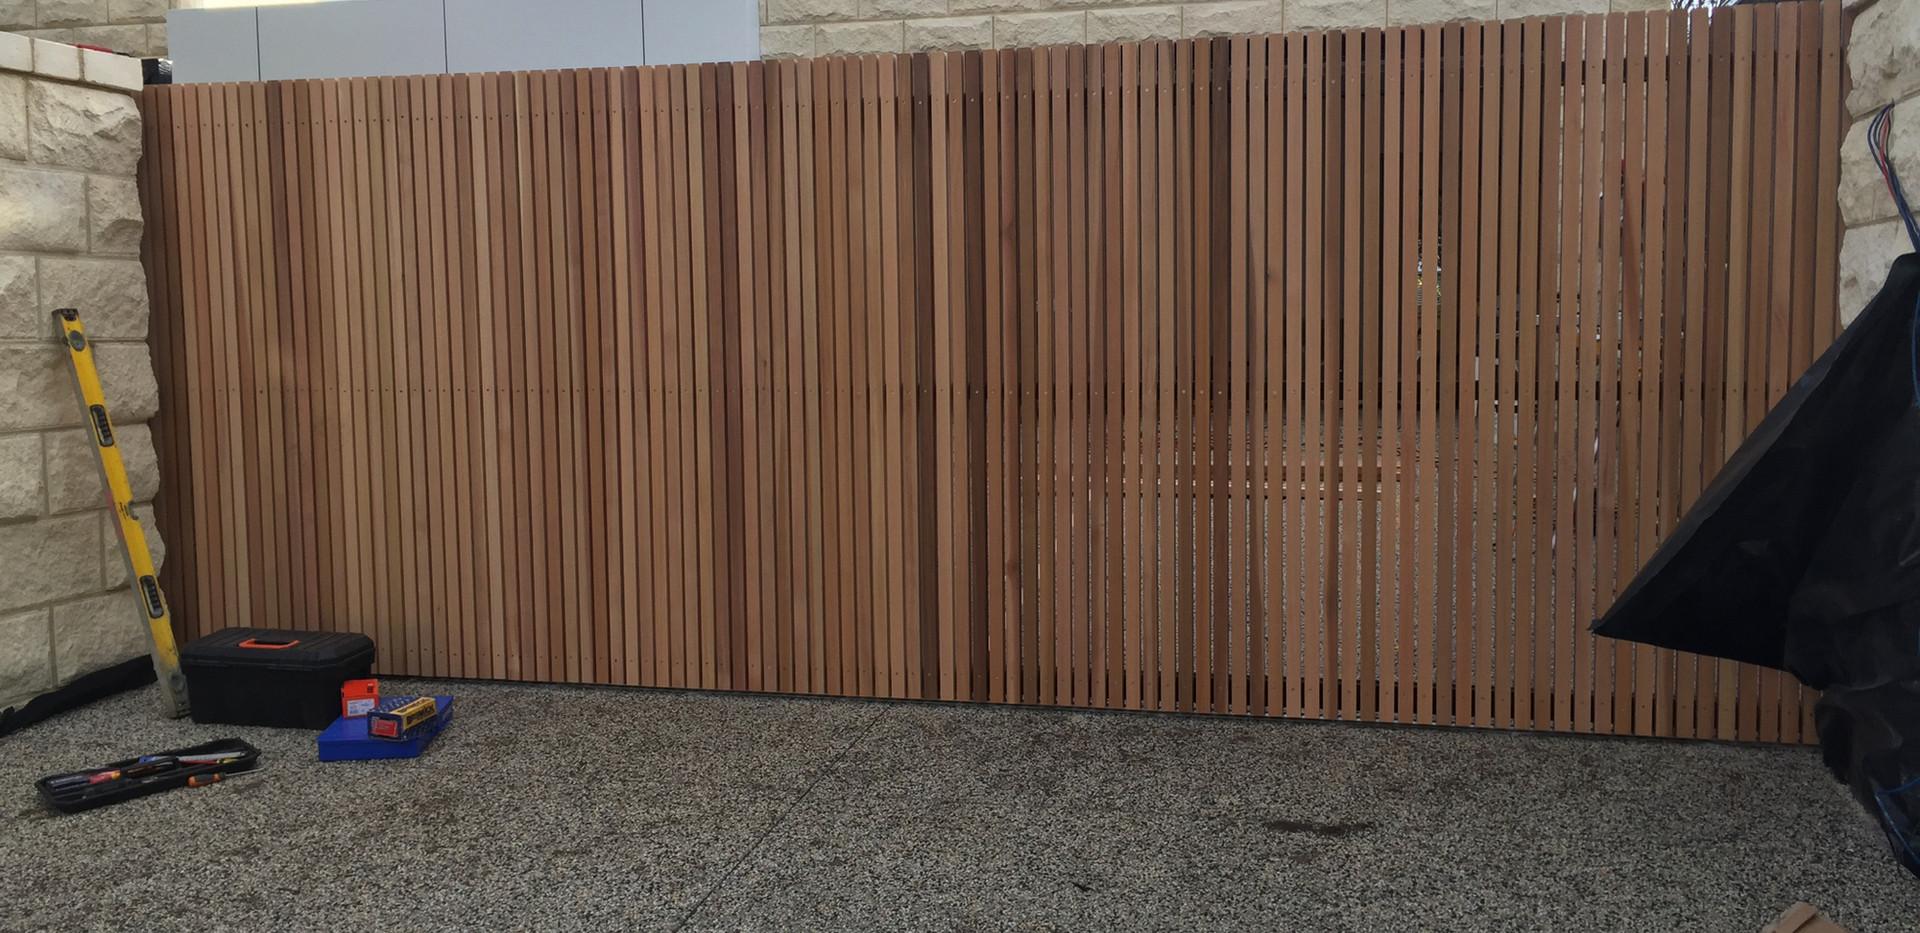 feature fence Mornington Peninsula Fences